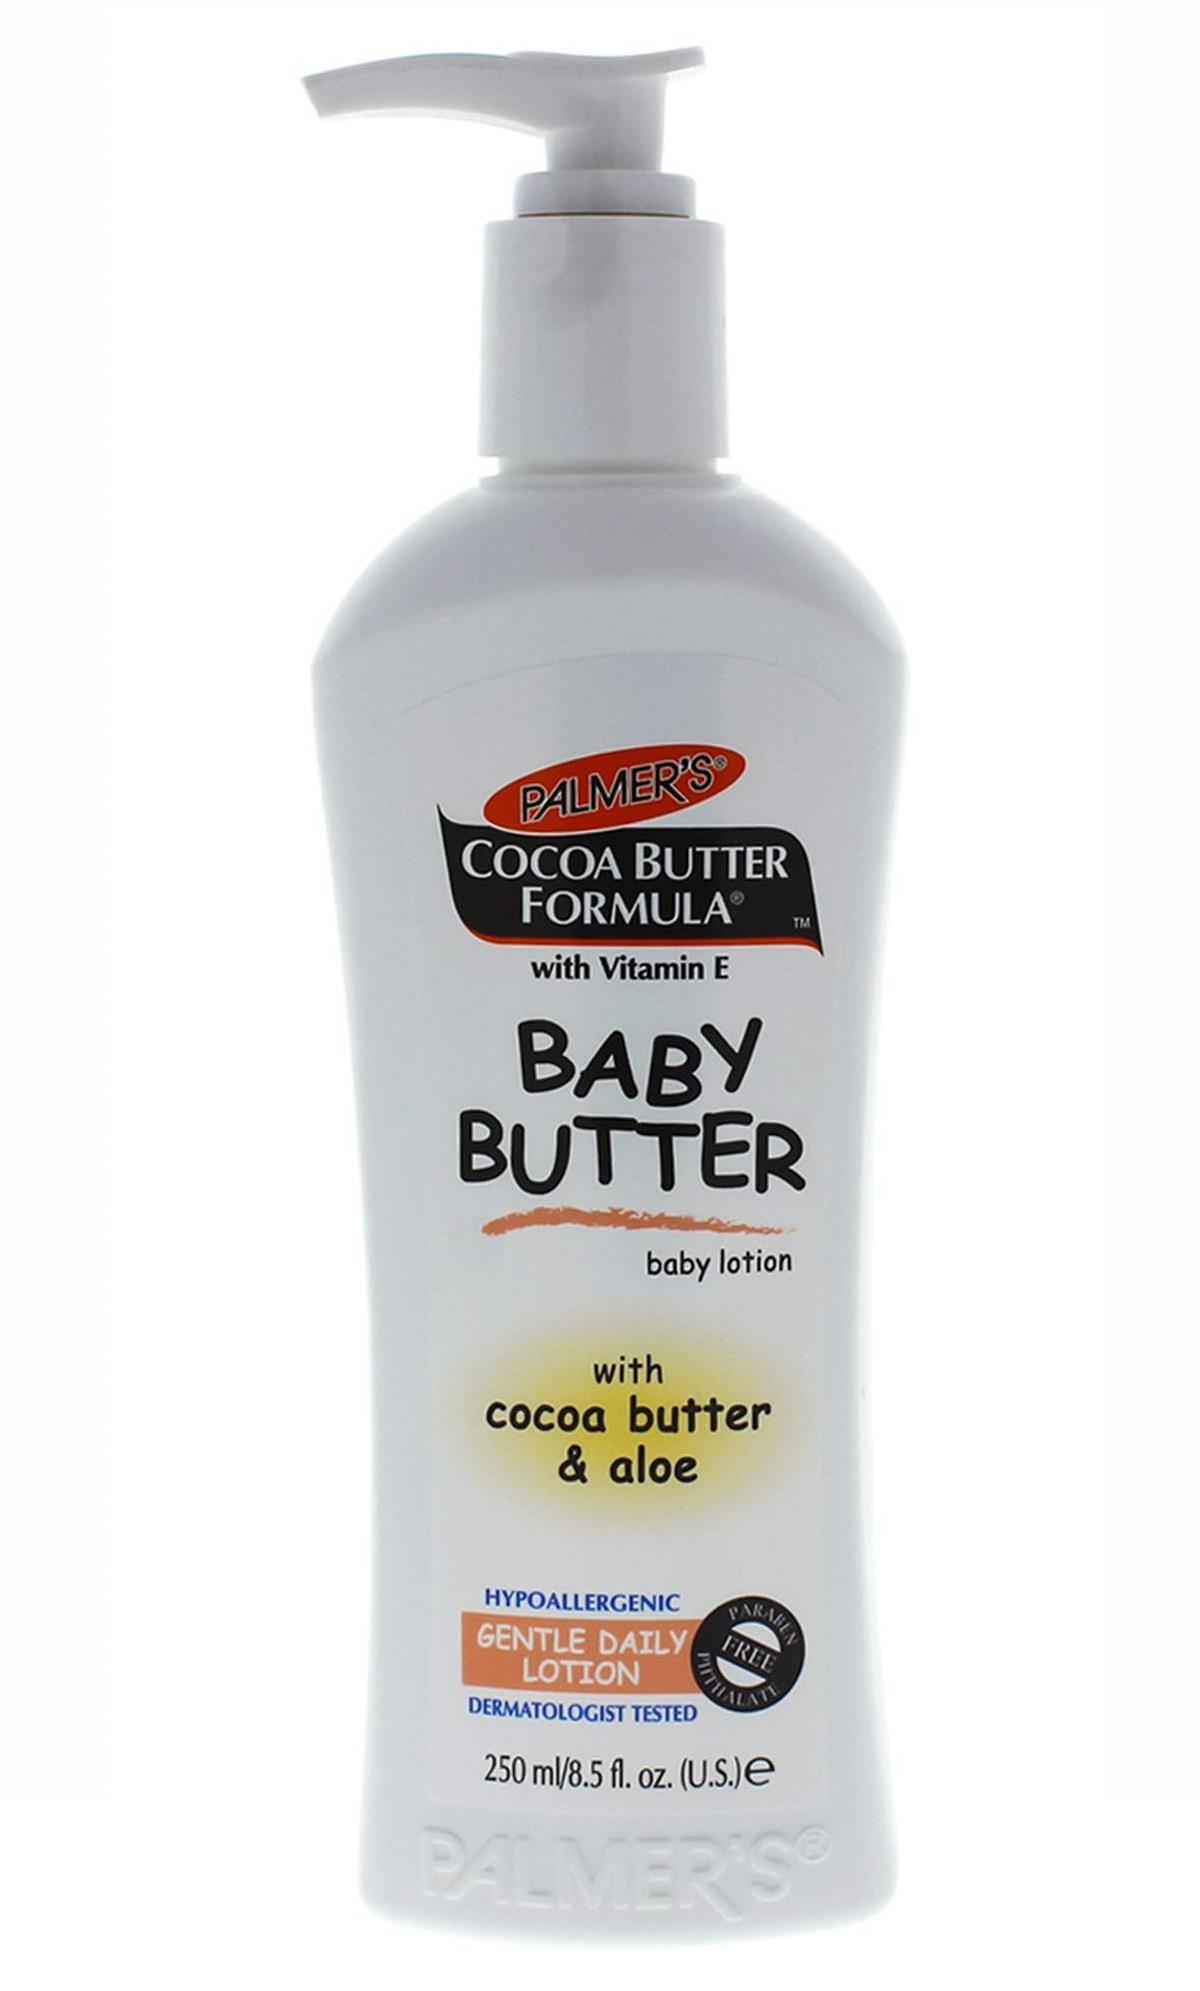 Palmer's Kakao Yağlı Bebek Masaj Losyonu 250 ml